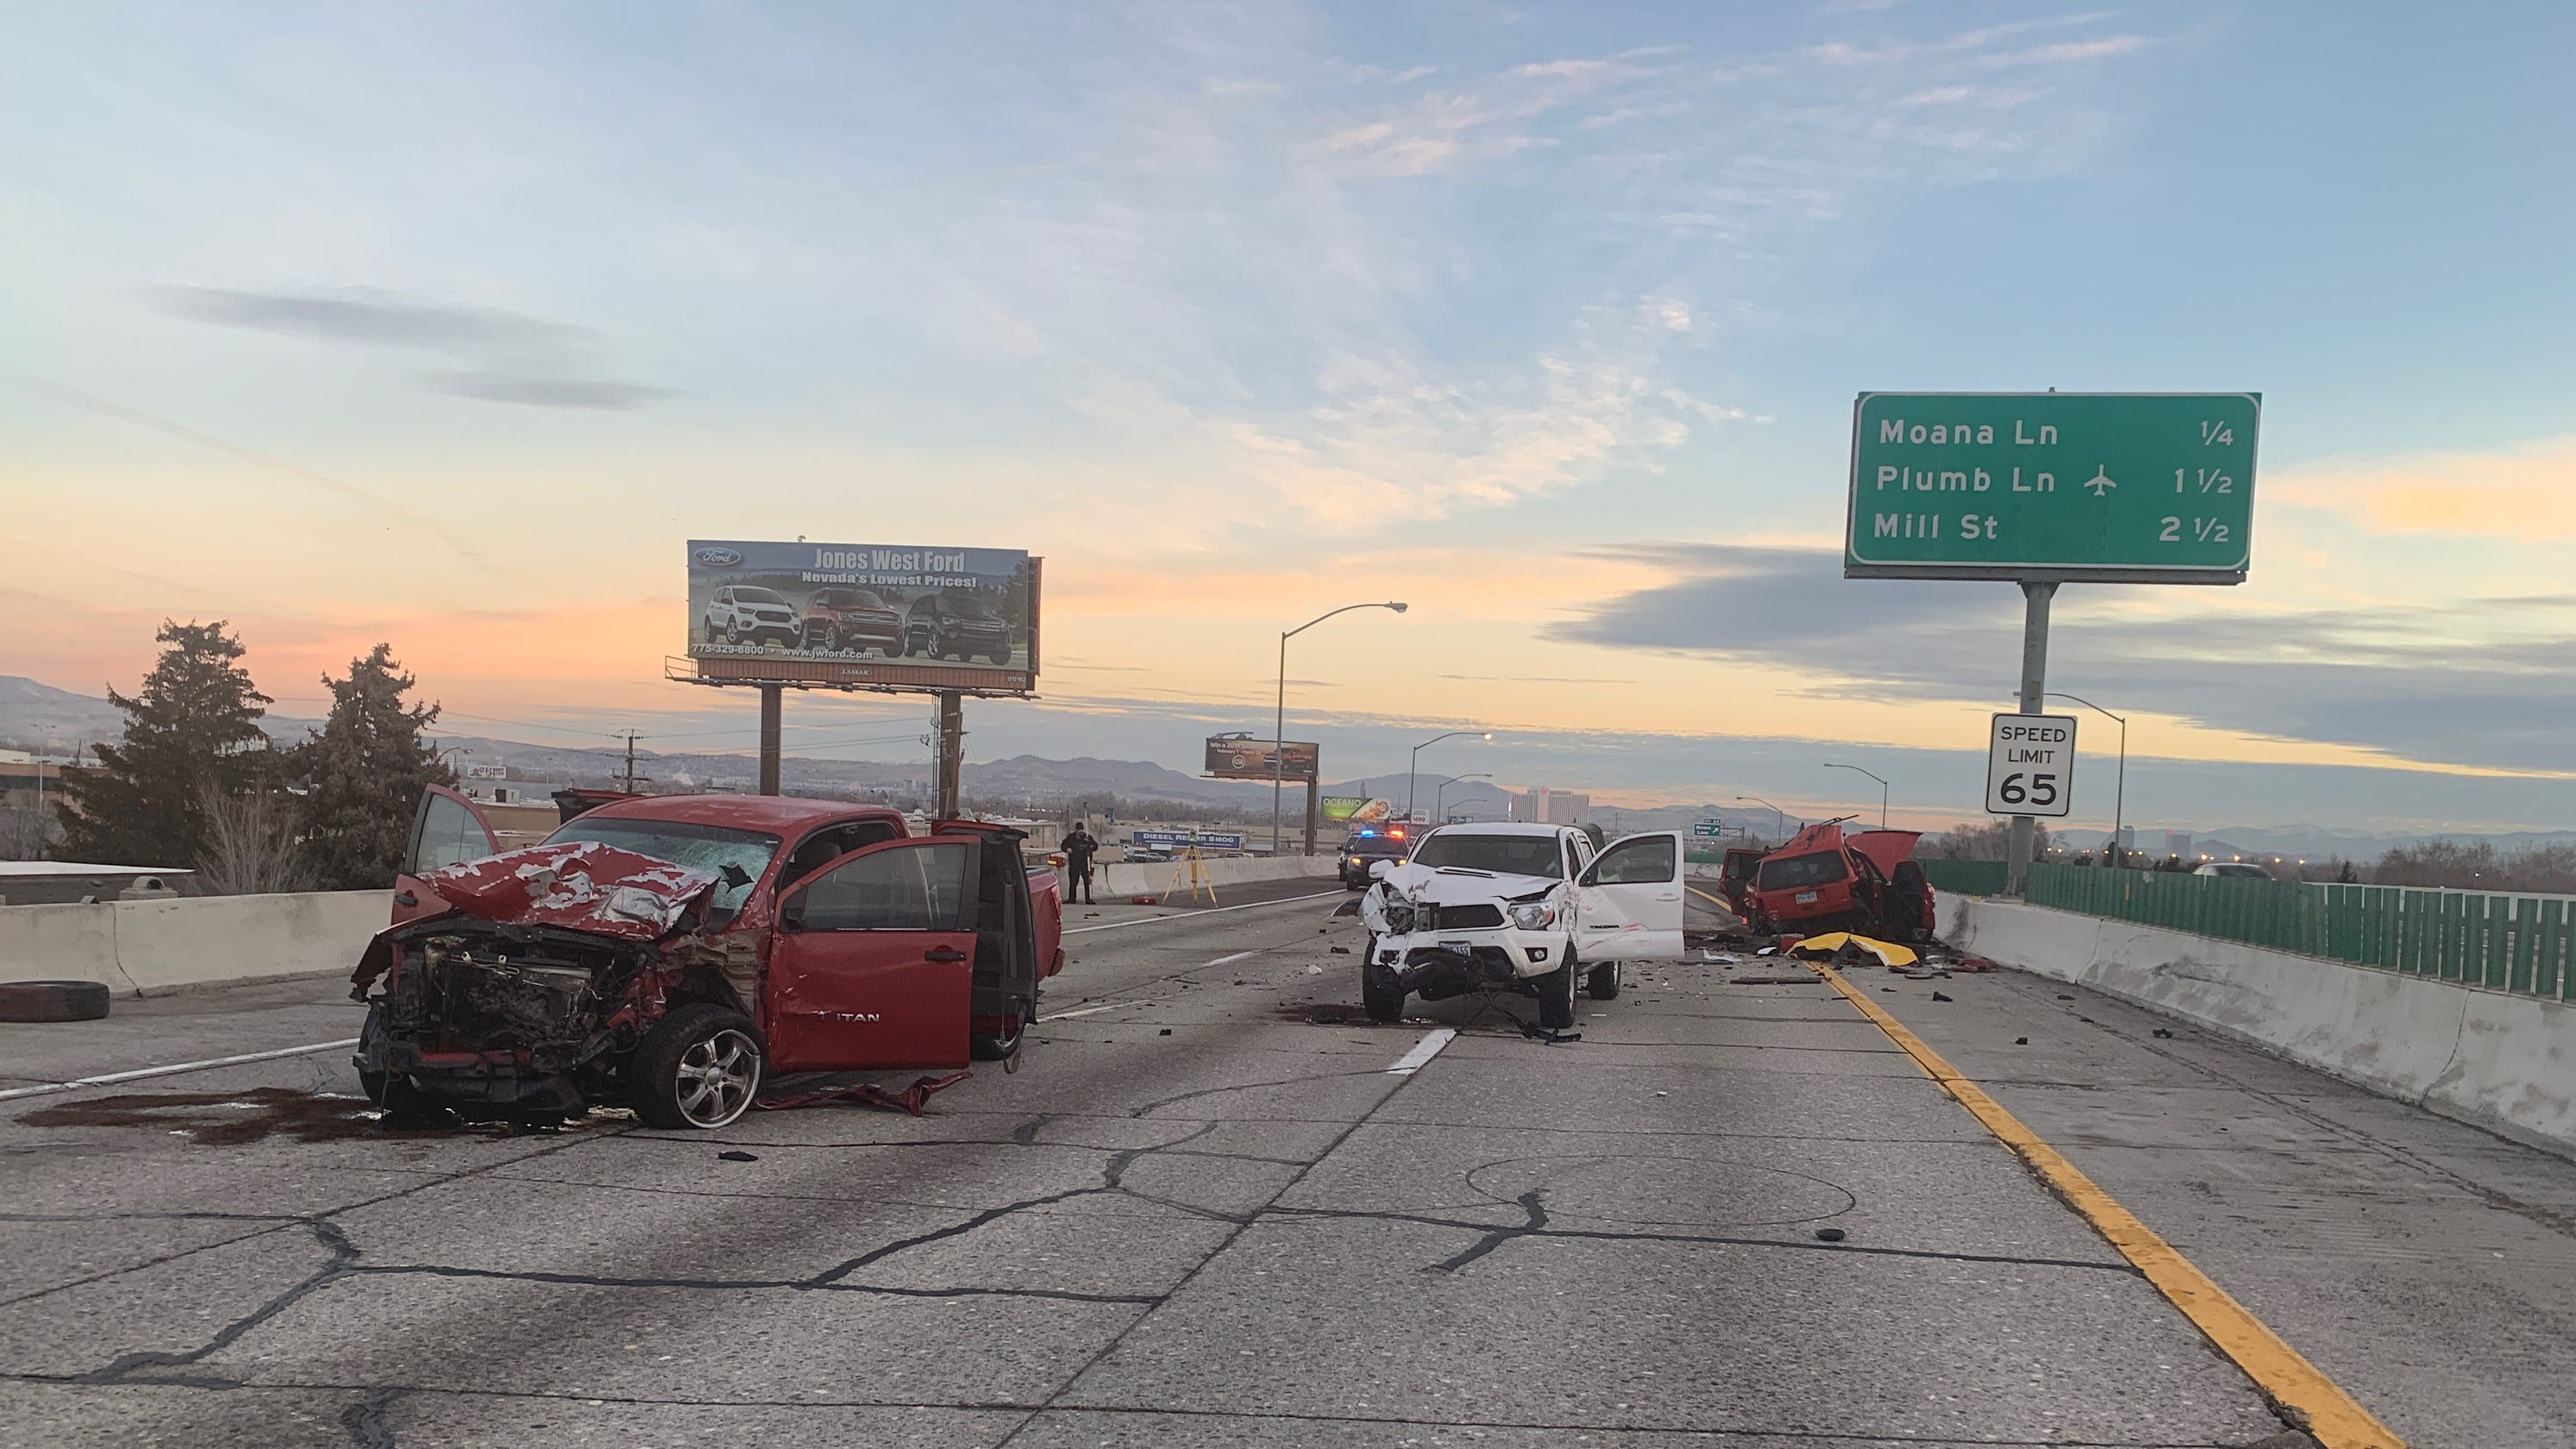 Wellington Man Killed In Reno Accident